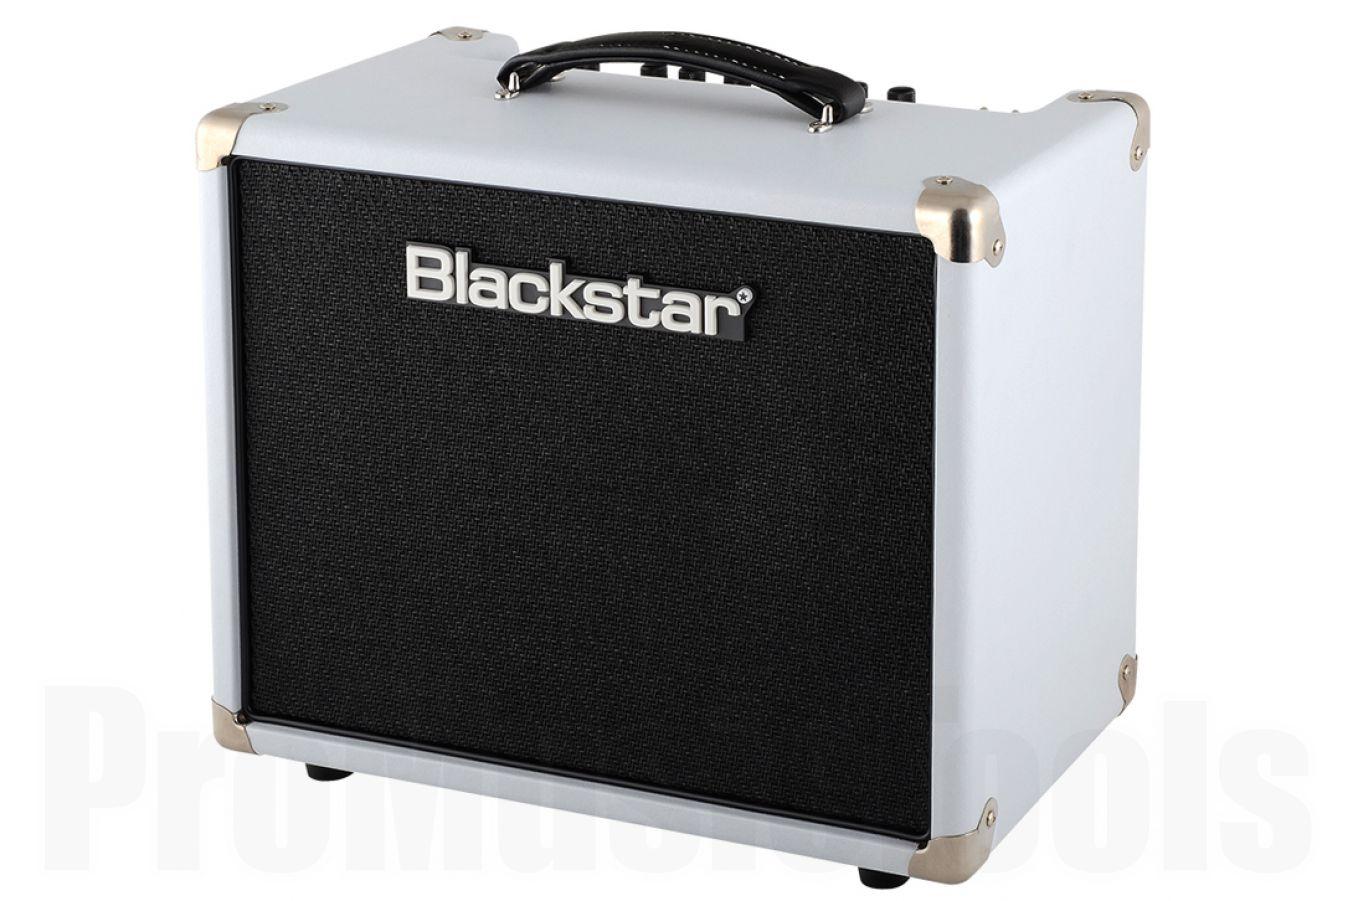 Blackstar HT-5CR-W Combo - Limited Edition